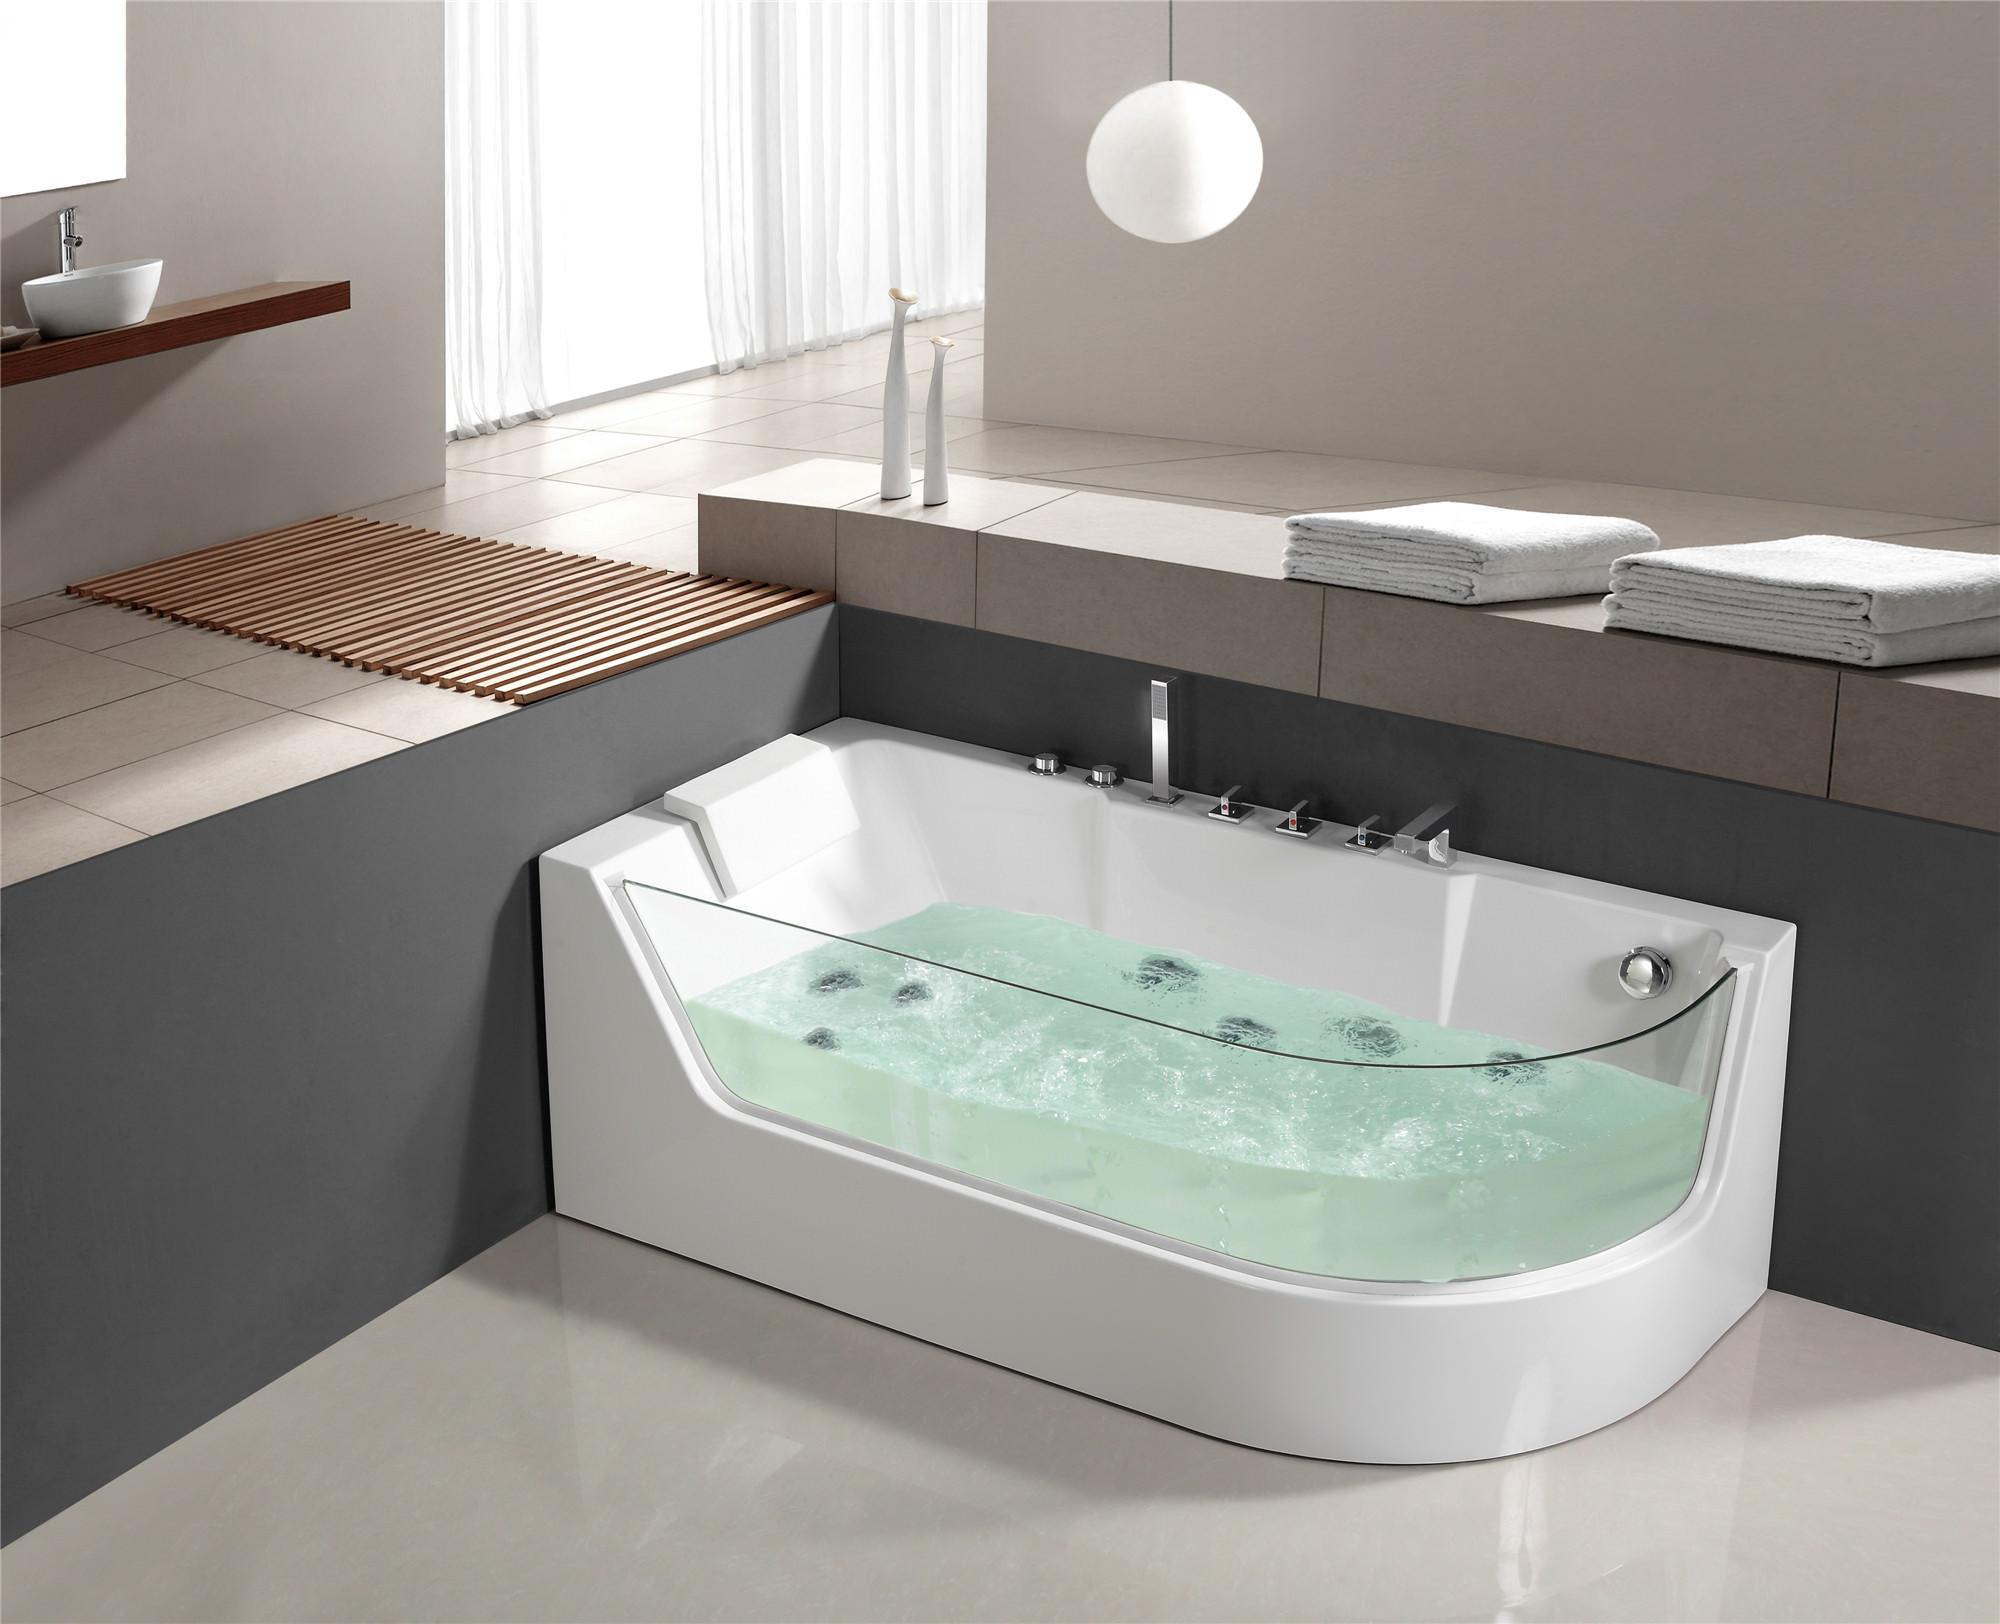 whirlpool bain remous douche jacuzzi baignoire pool lxw 1533 gauche ebay. Black Bedroom Furniture Sets. Home Design Ideas